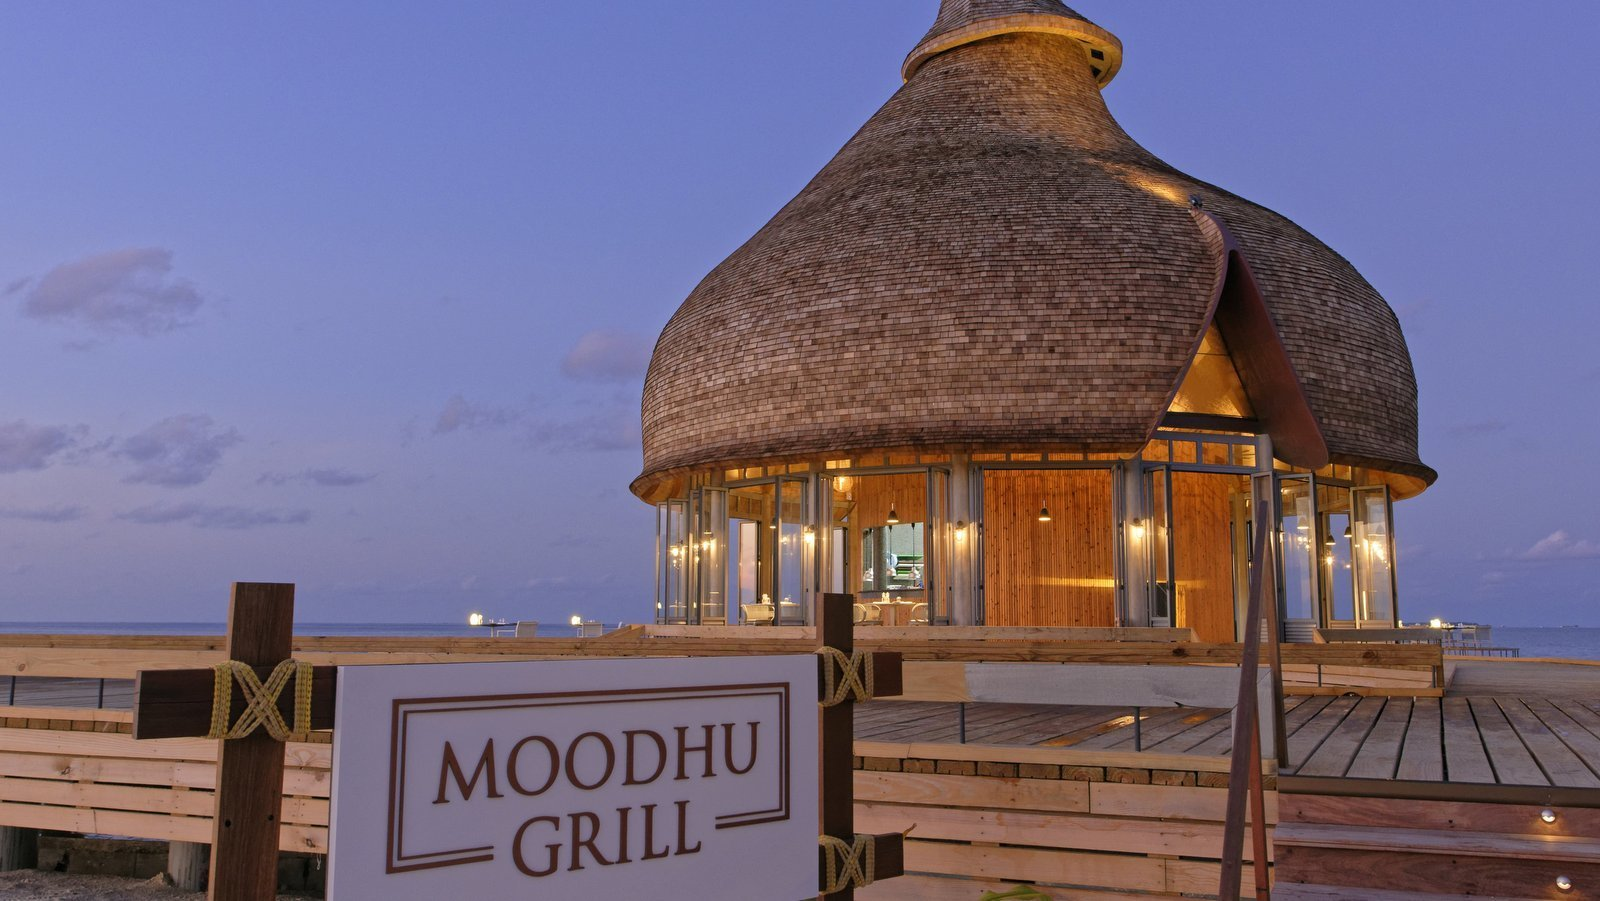 Мальдивы, отель LTI Maafushivaru Maldives, ресторан Moodhu Grill